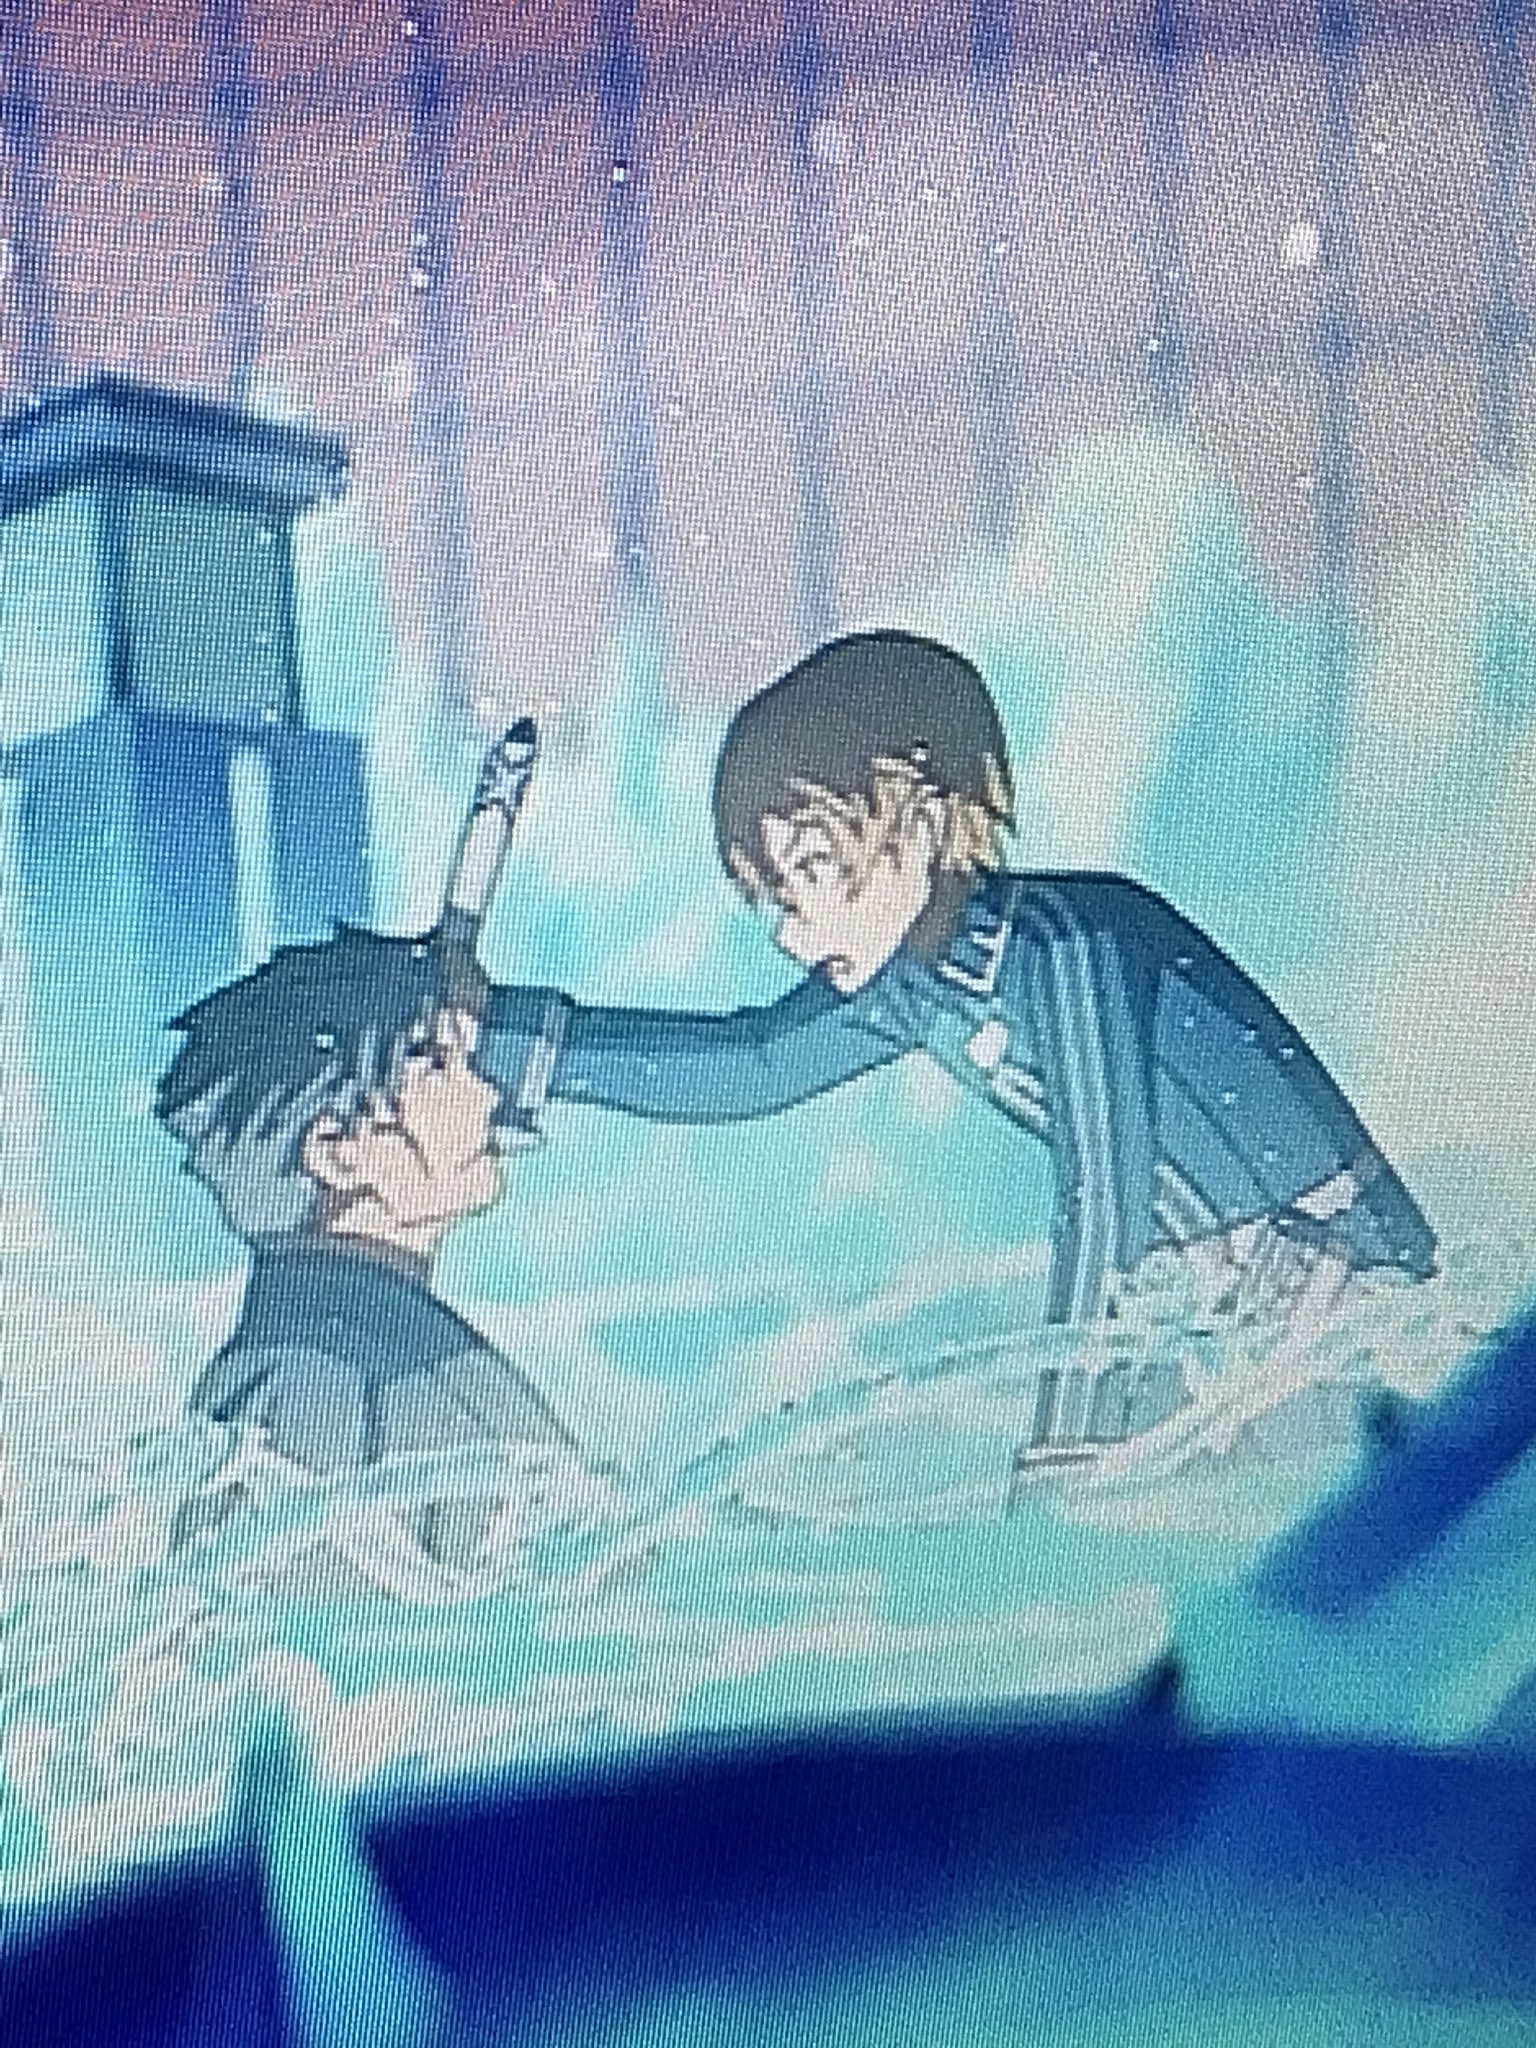 Eugeo is top Bercouli is bottom #sao_anime https://t.co/ji1fcGm6Wf